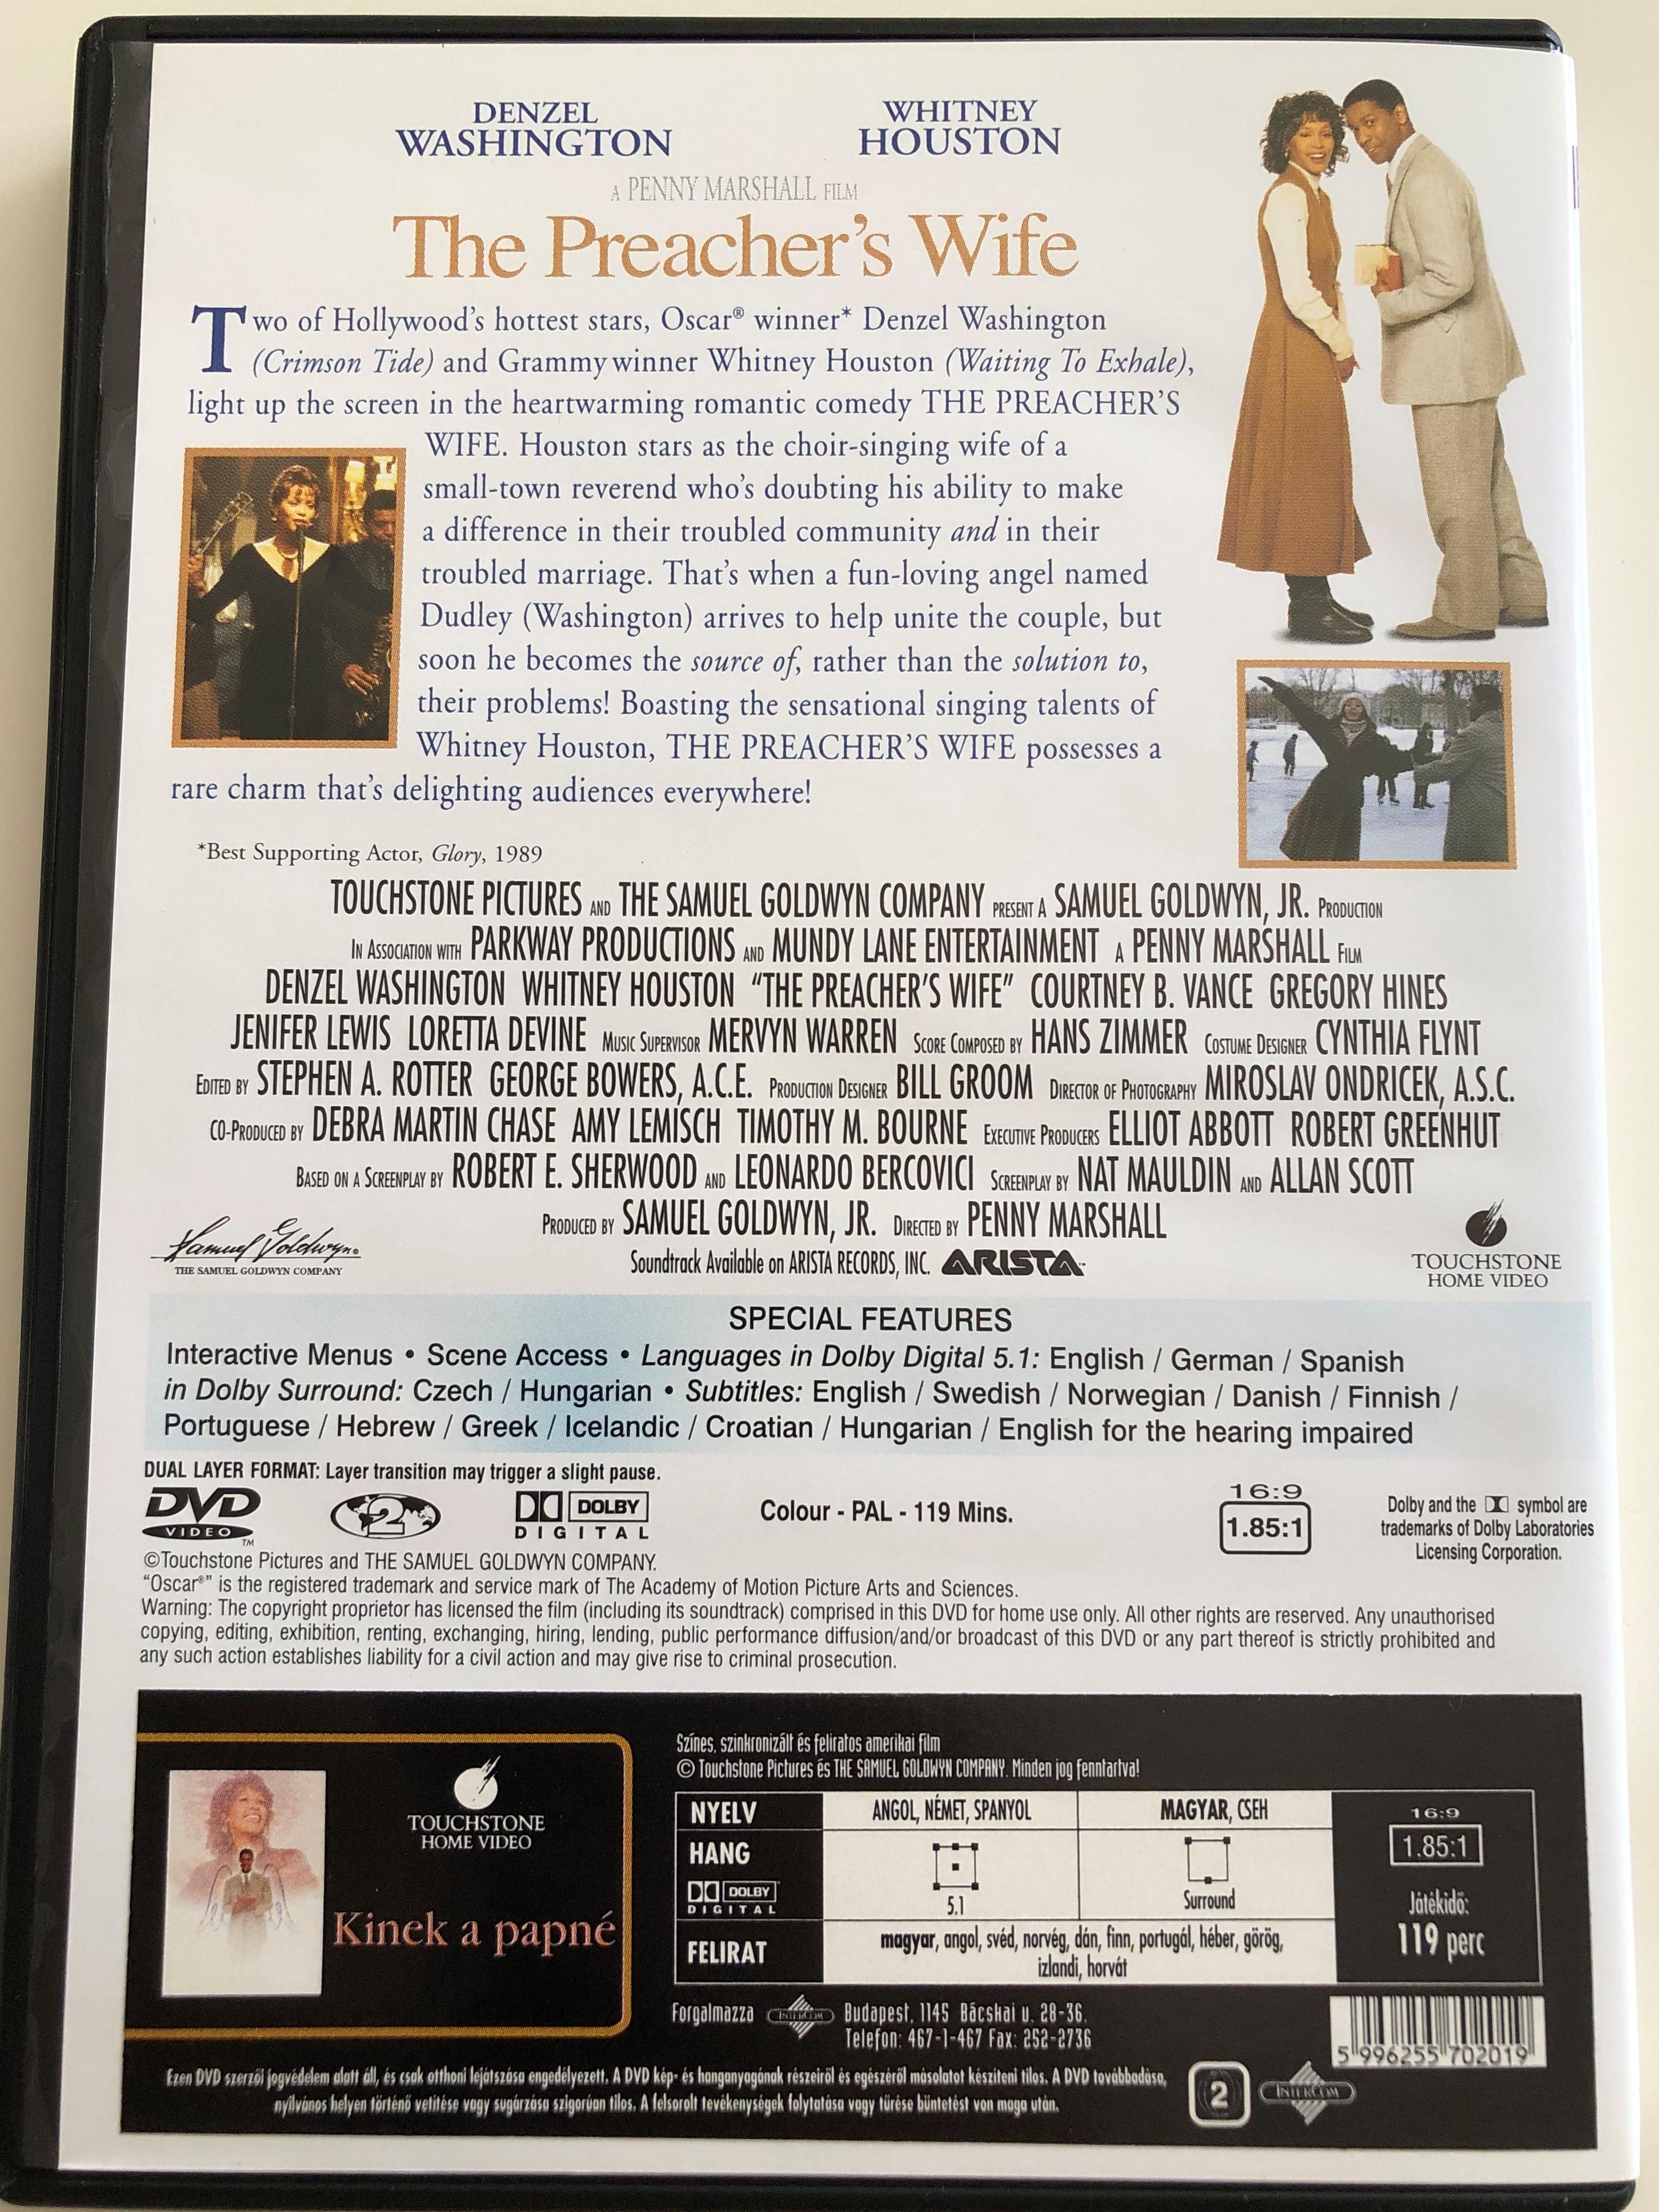 the-preacher-s-wife-dvd-1996-rendezvous-mit-einem-engel-directed-by-penny-marshall-starring-denzel-washington-whitney-houston-courtney-b.-vance-gregory-hines-jenifer-lewis-loretta-devine-4-.jpg